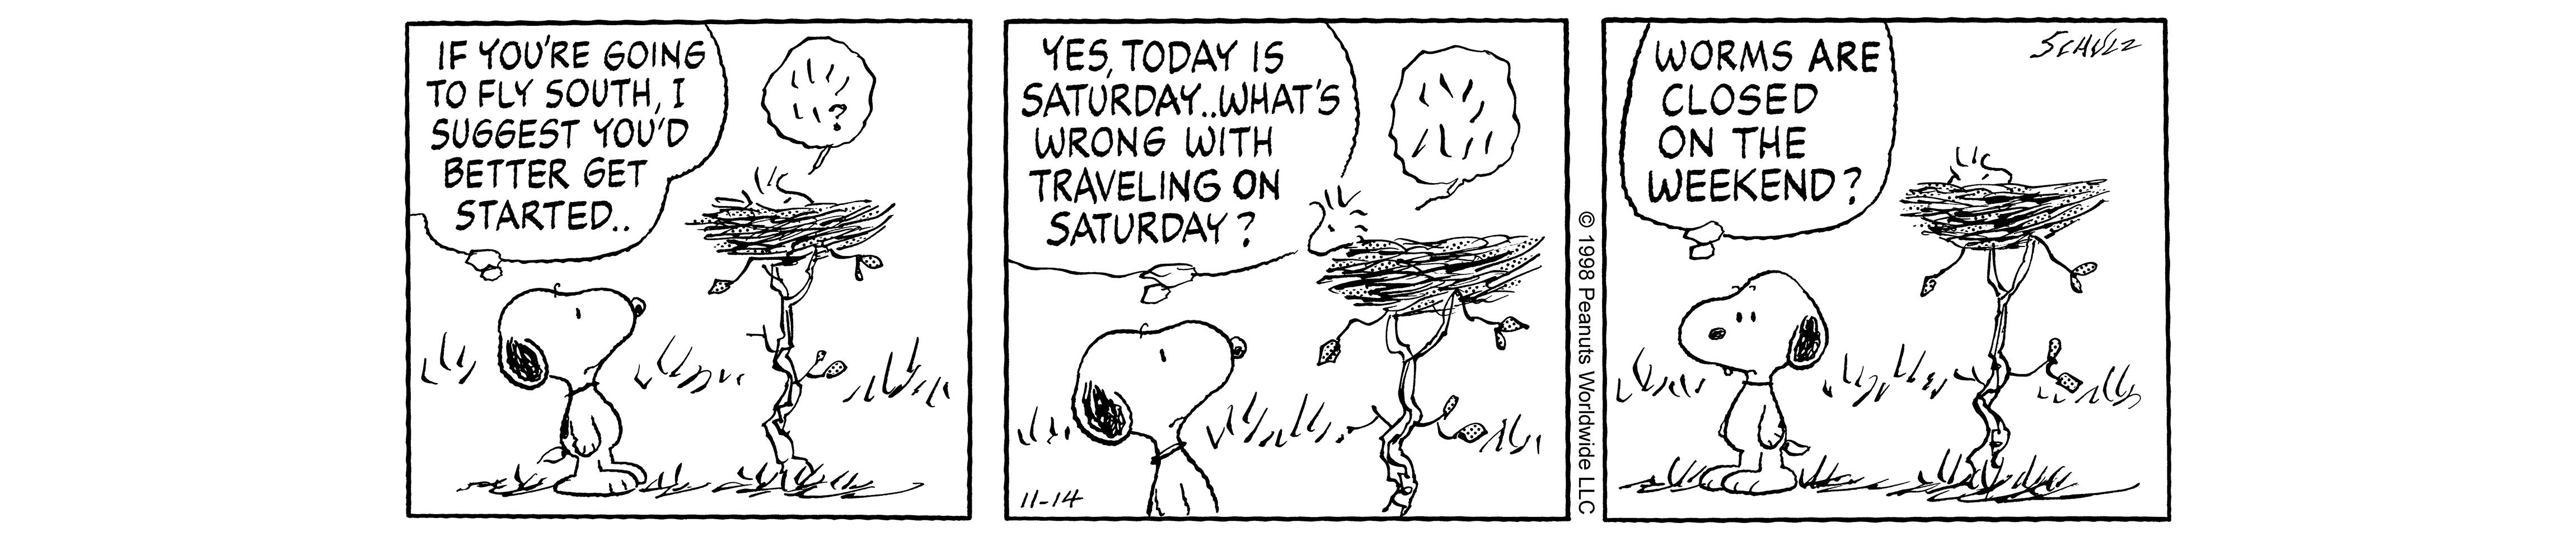 A comic strip of a dog and a little bird in a bird's nest.